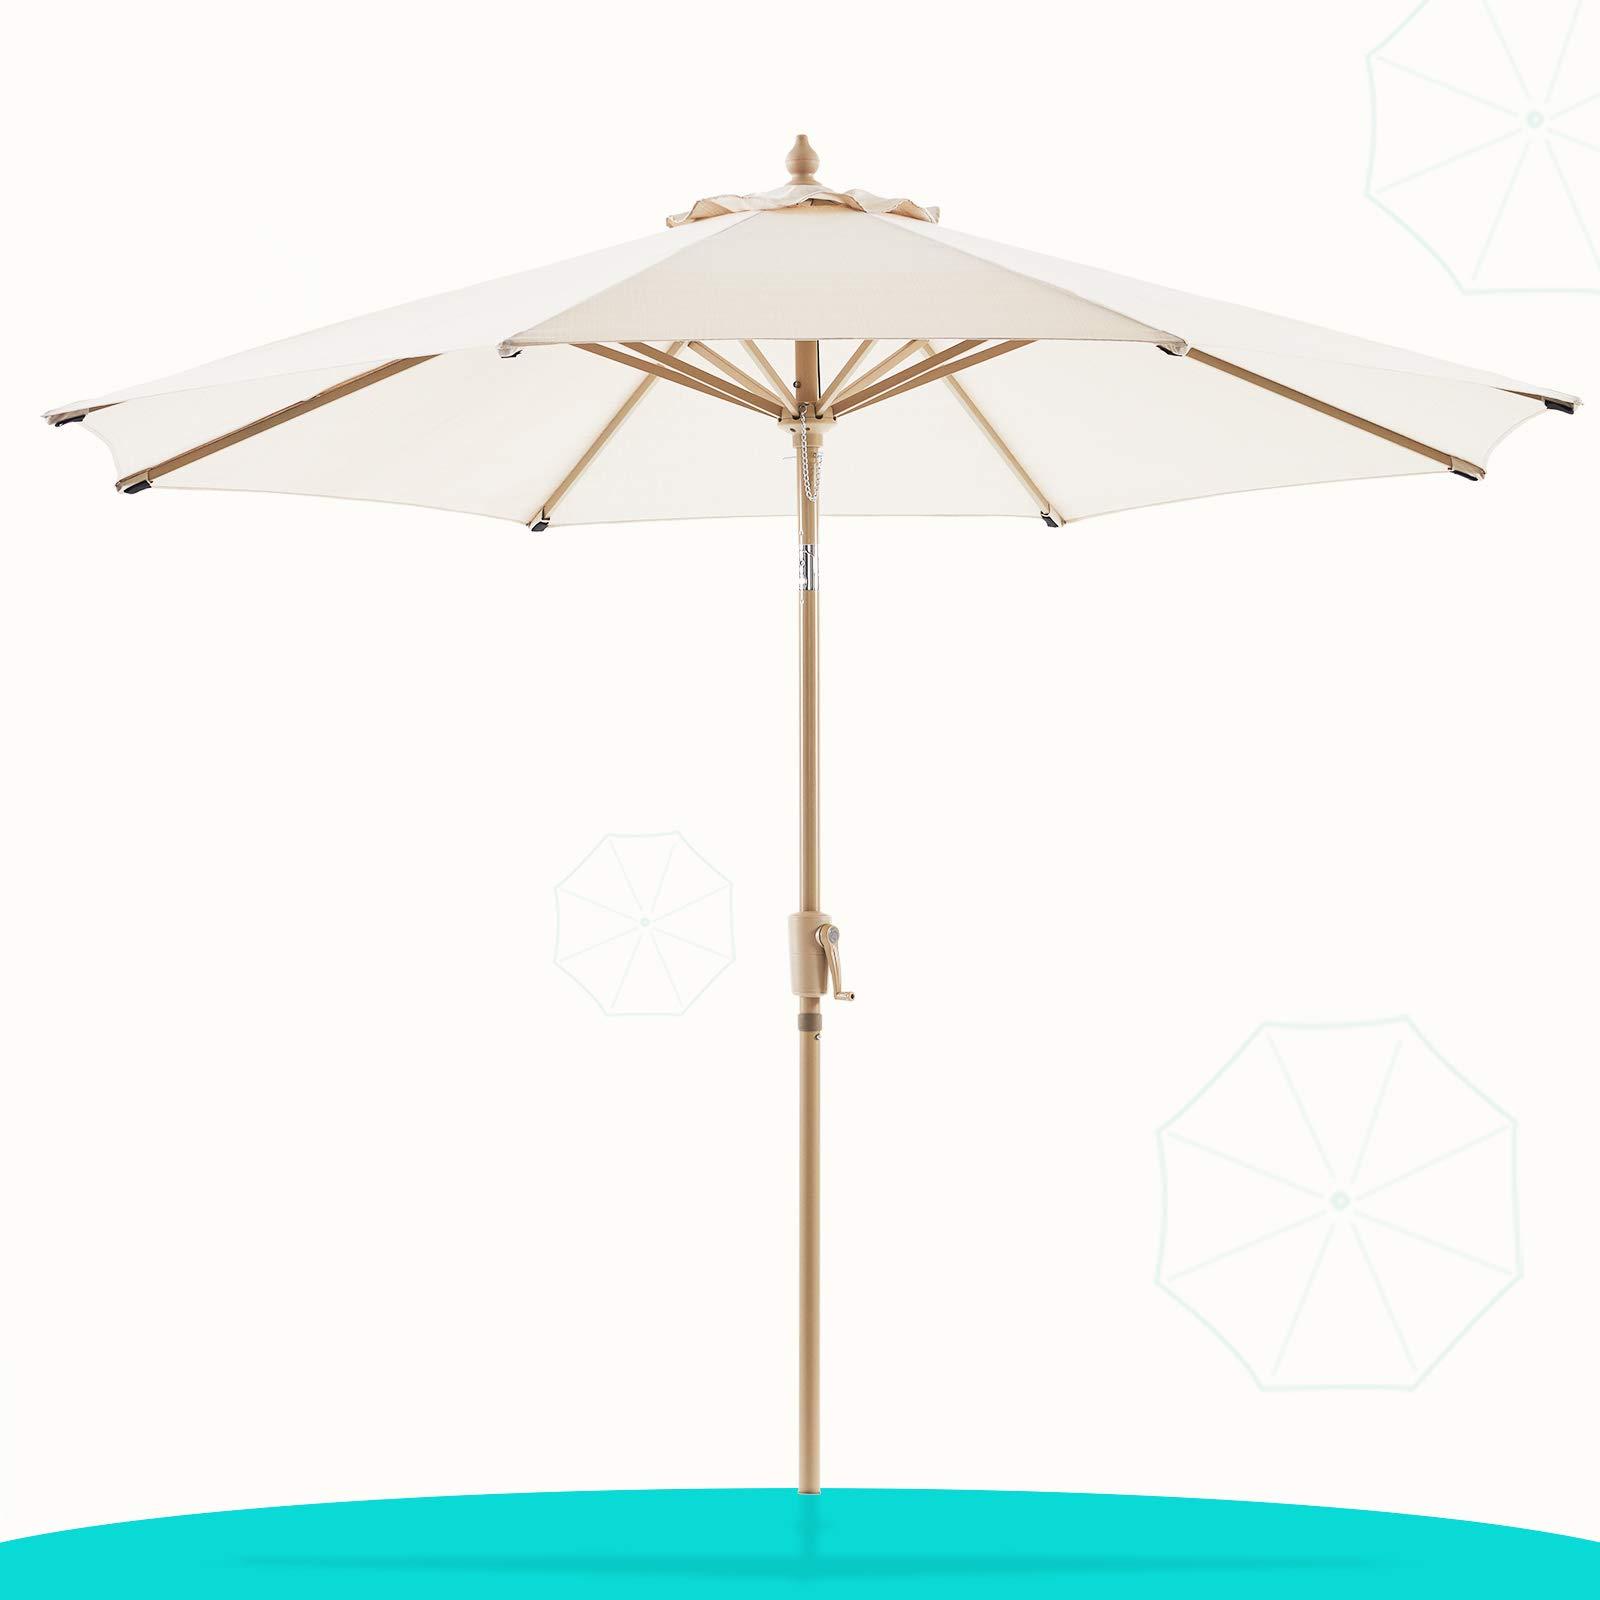 LE CONTE Olefin 9 ft. Patio Umbrella Outdoor Market Umbrellas Table Umbrellas | 3 Years Non-Fading Fabric & Push Button Tilt | Best for Deck, Balcony, Garden, Lawn & Pool (Beige)